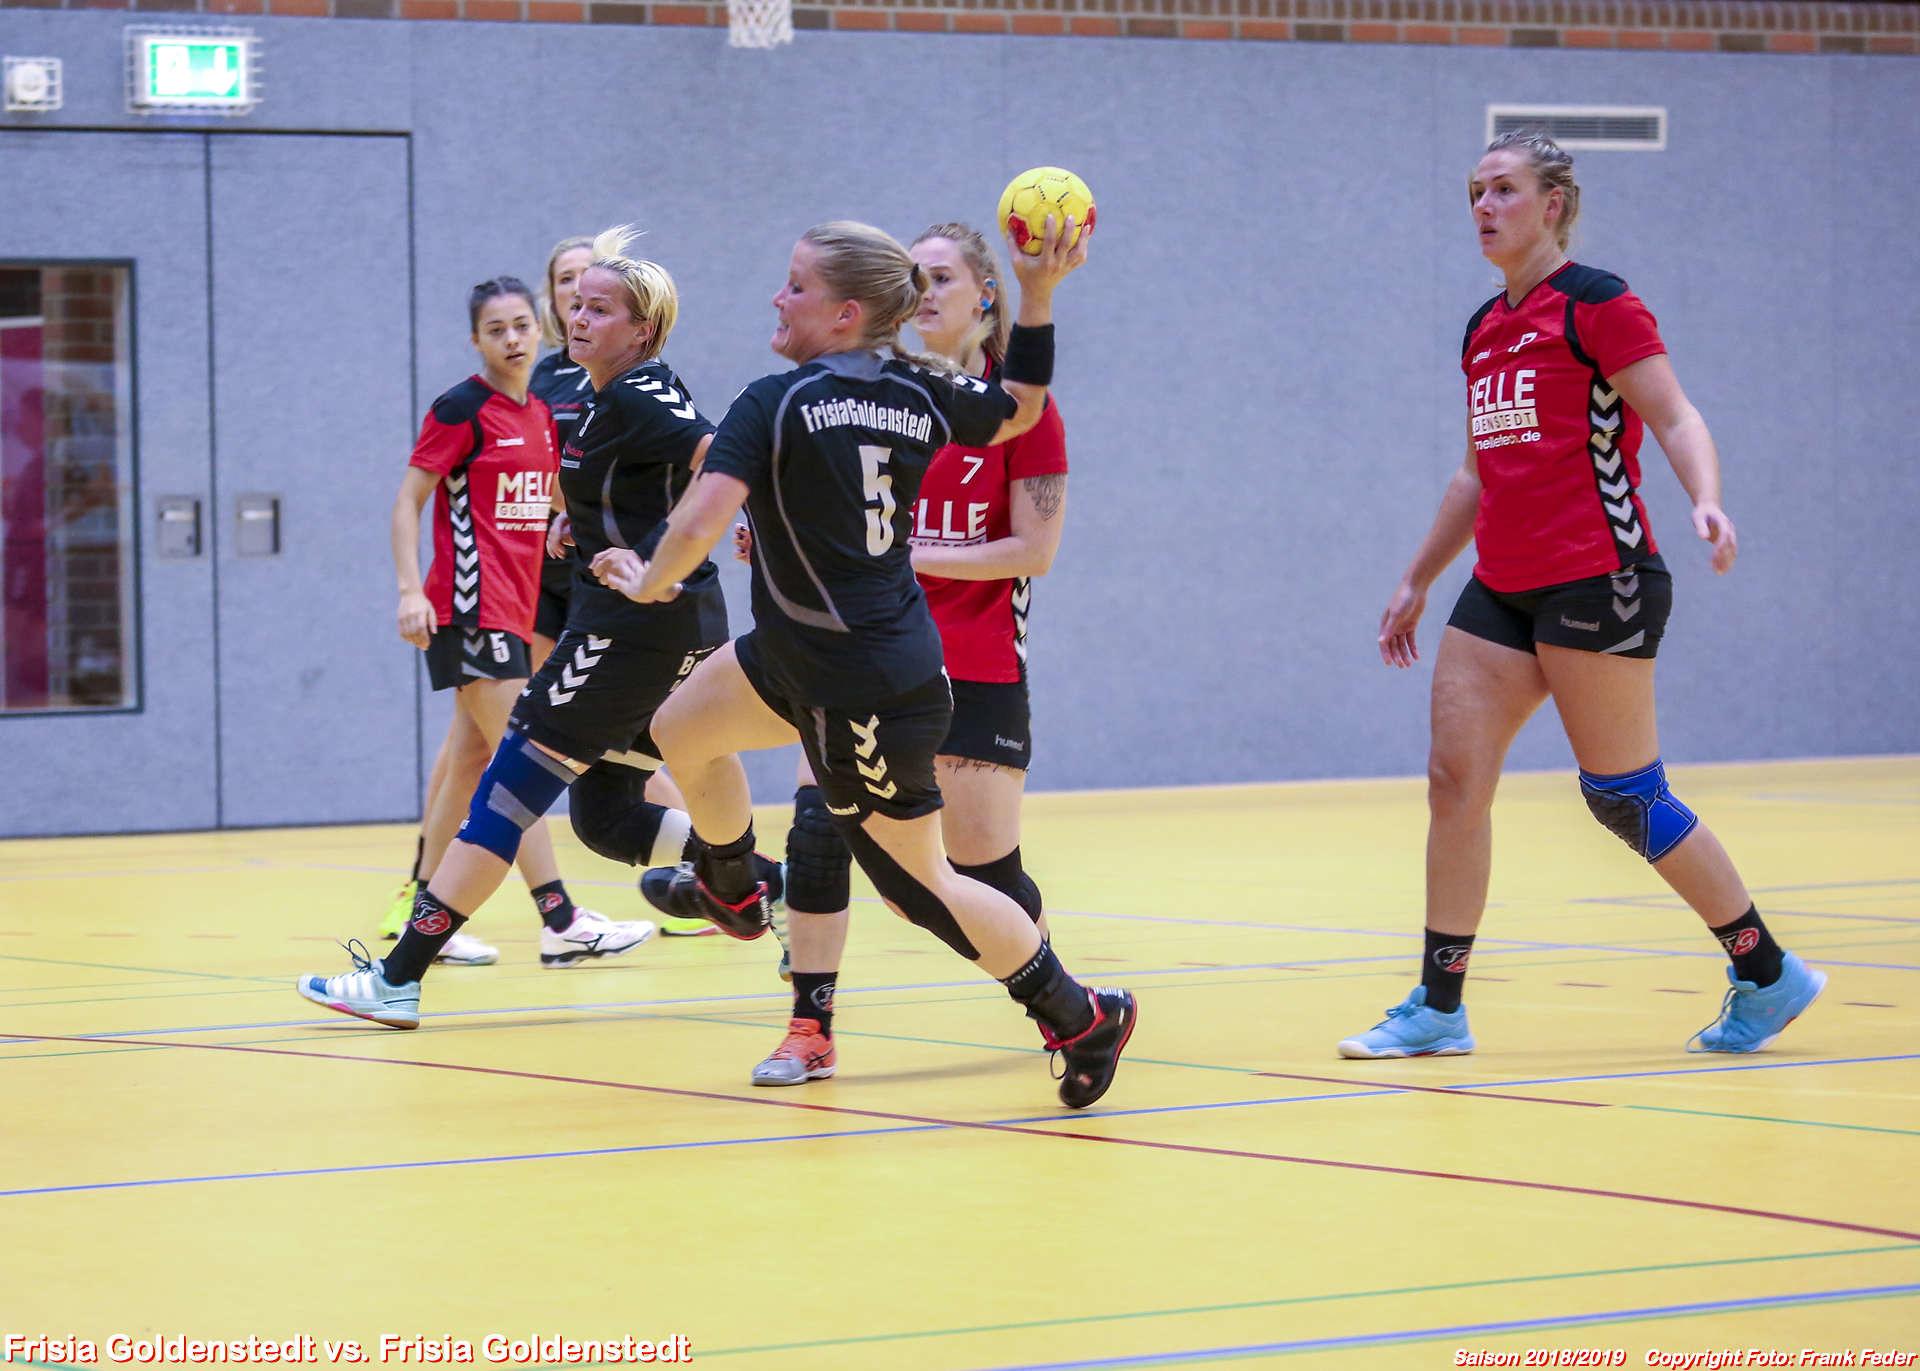 WEB_01-Frisia vs Frisia 2018_09_02_1744_074.jpg